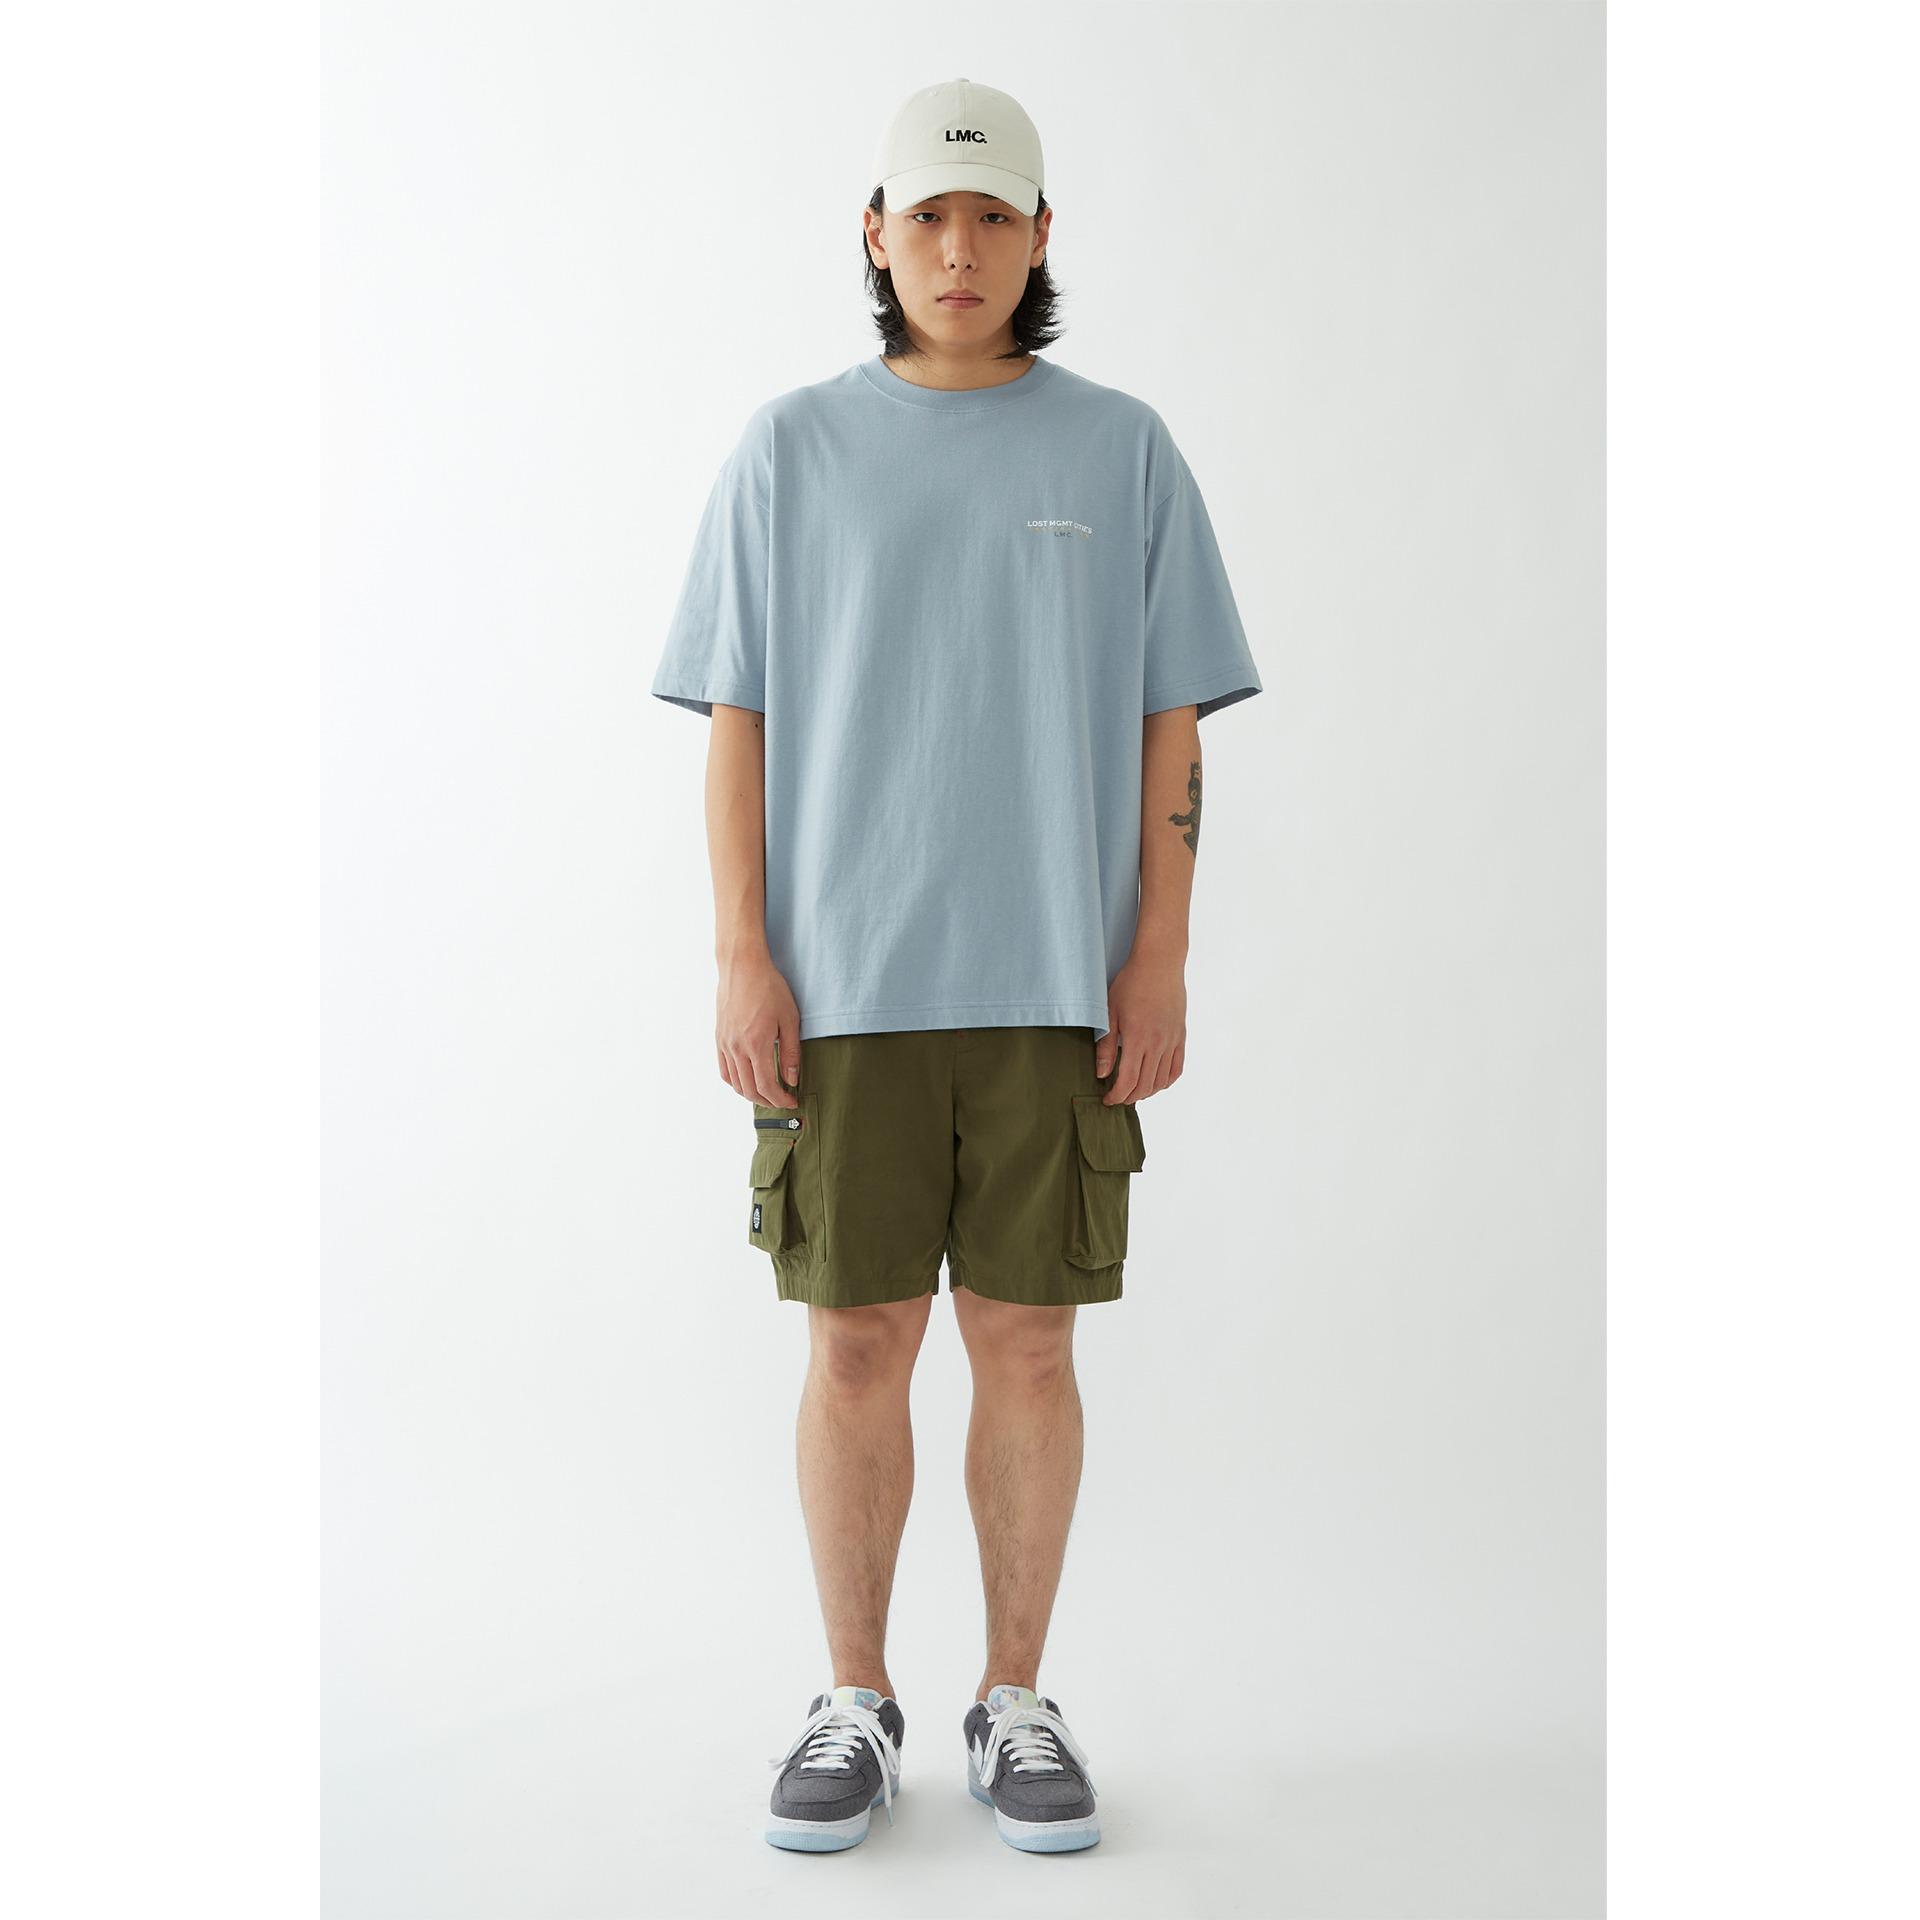 layer-LMC INSPIRATION TEE blue gray♡韓國男裝上衣